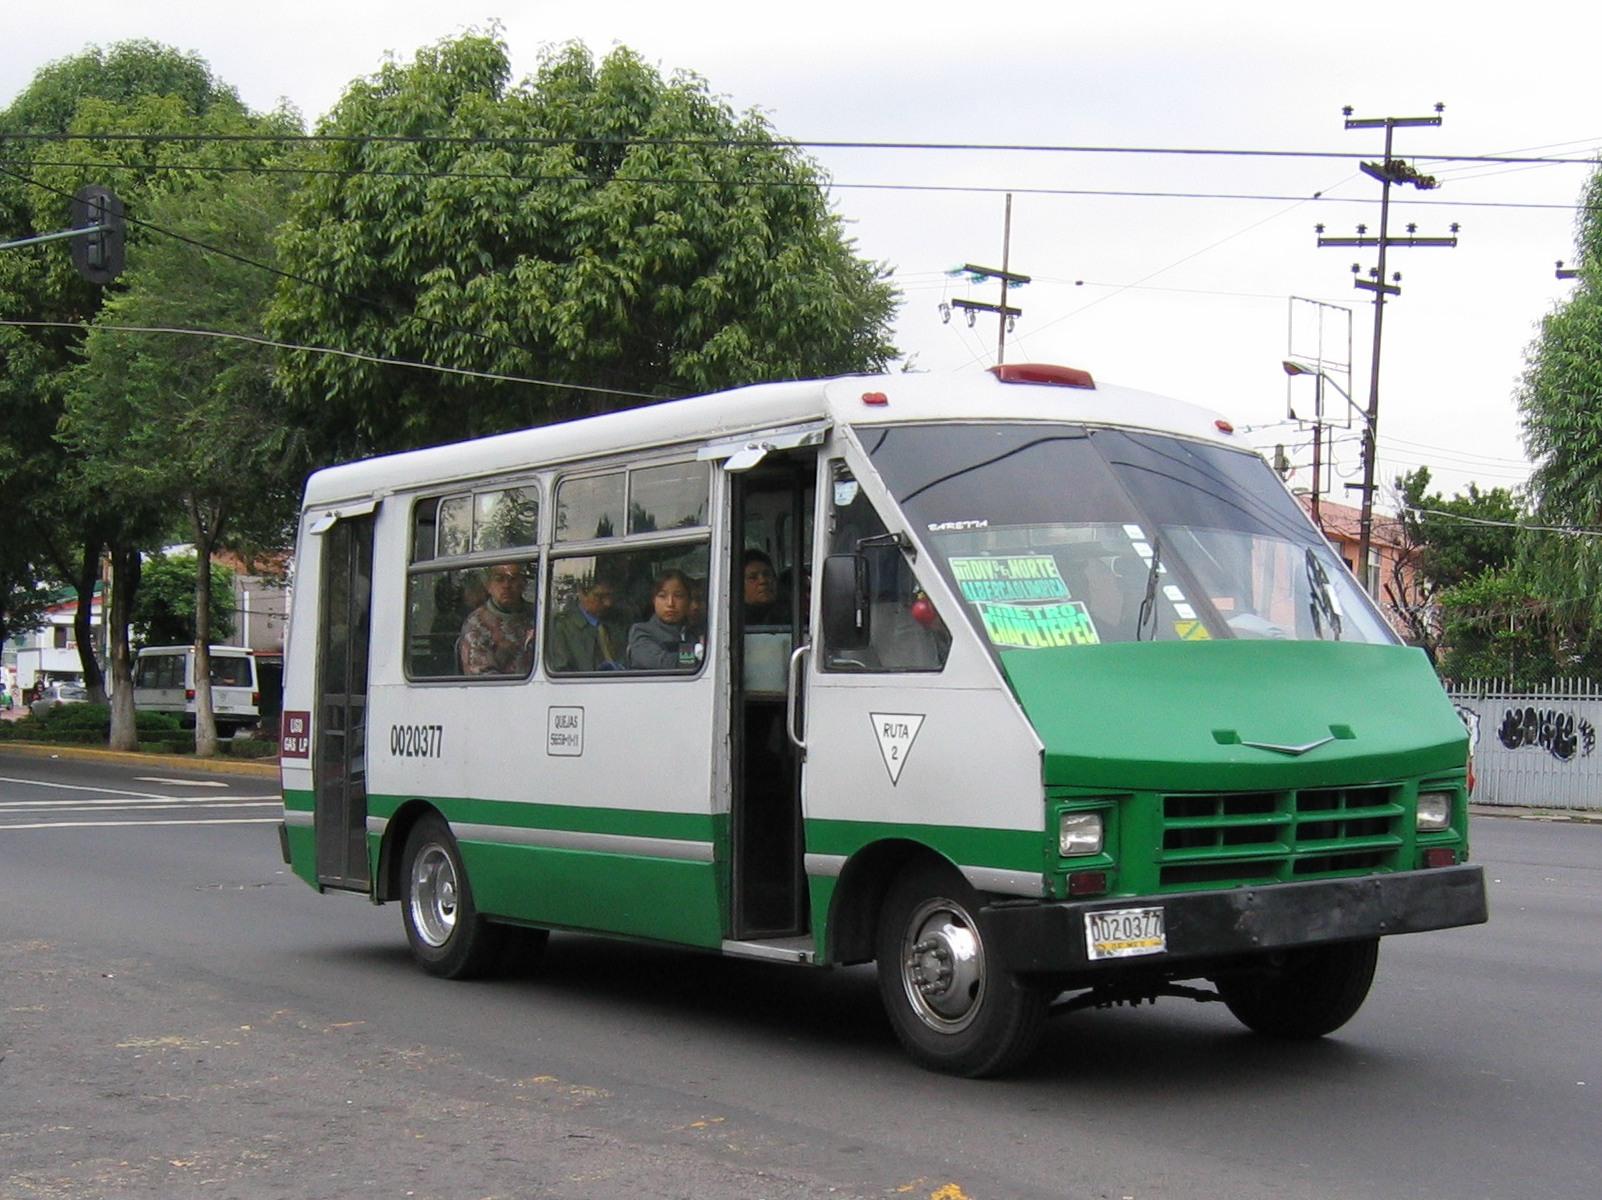 File:Mexico city microbus 1.jpg - Wikipedia, the free encyclopedia